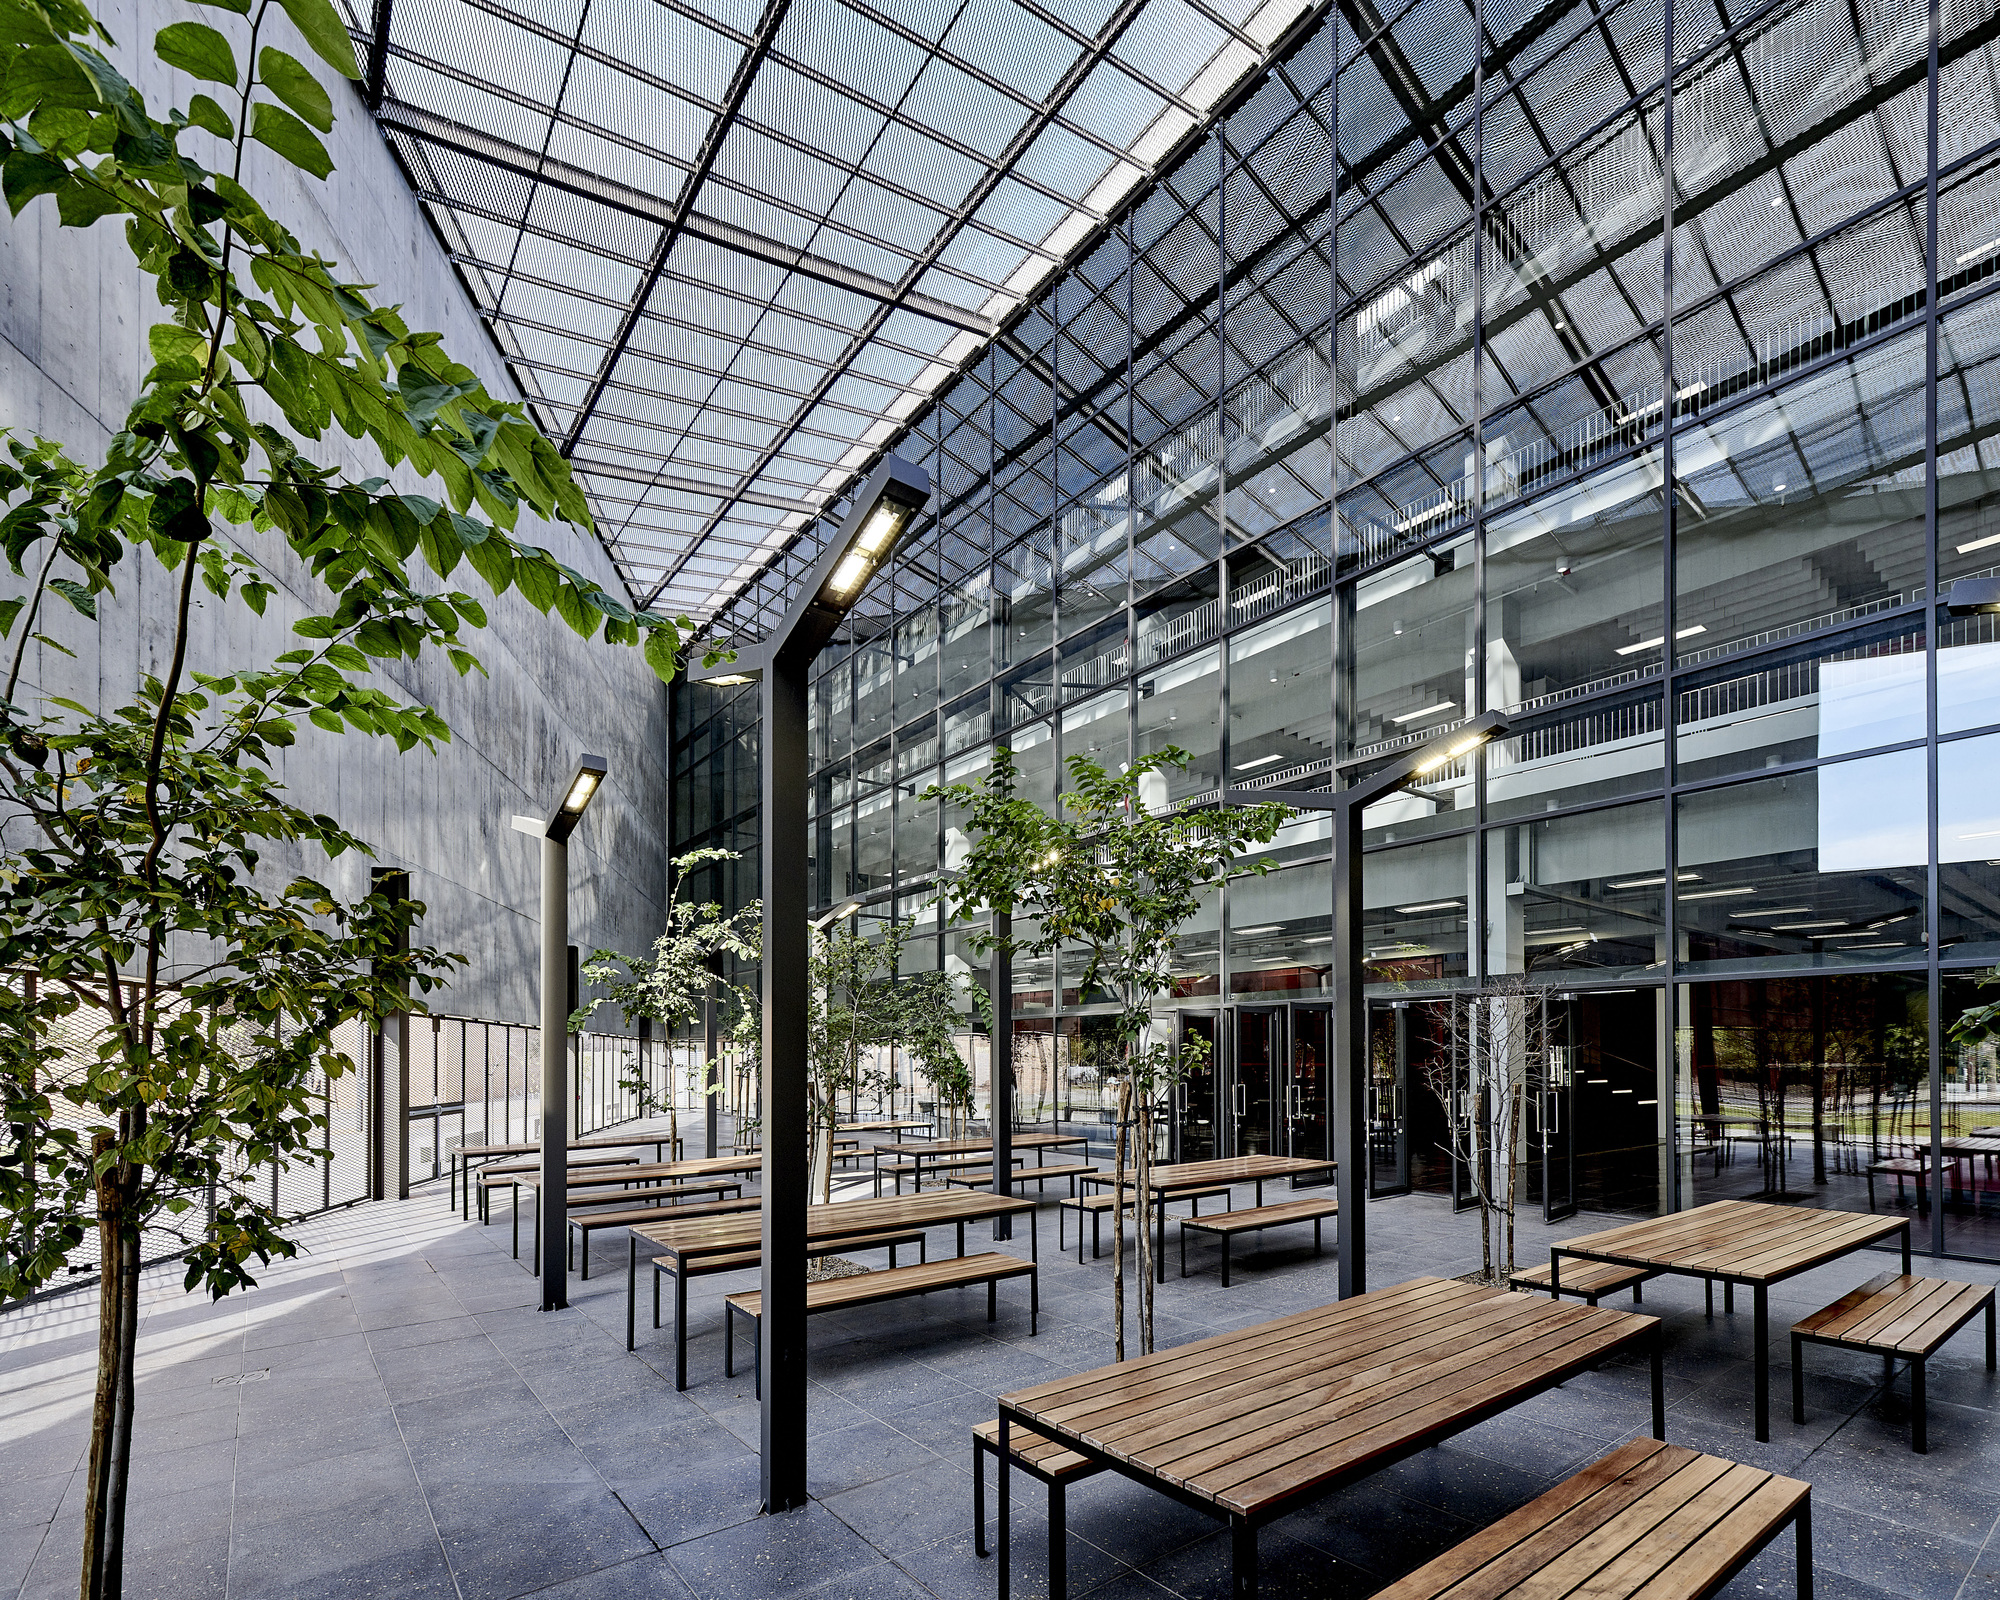 Sol Plaatje University Student Resource Center / Designworkshop